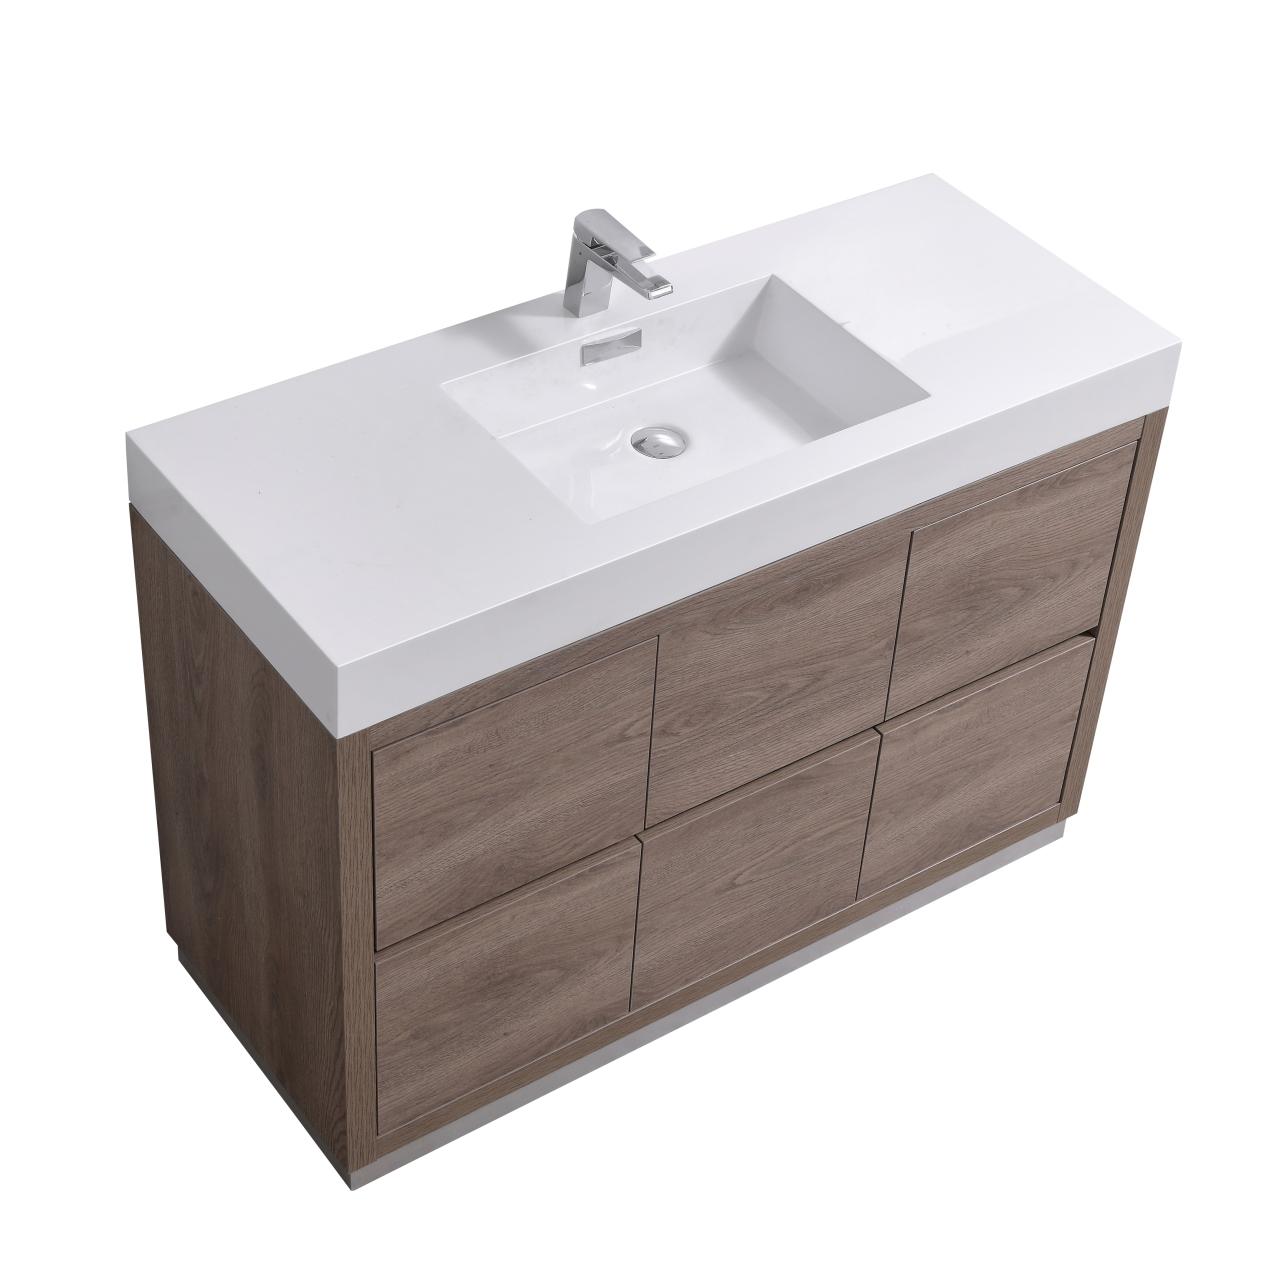 "Modern Lux 48"" Butternut Free Standing Modern Bathroom Vanity"